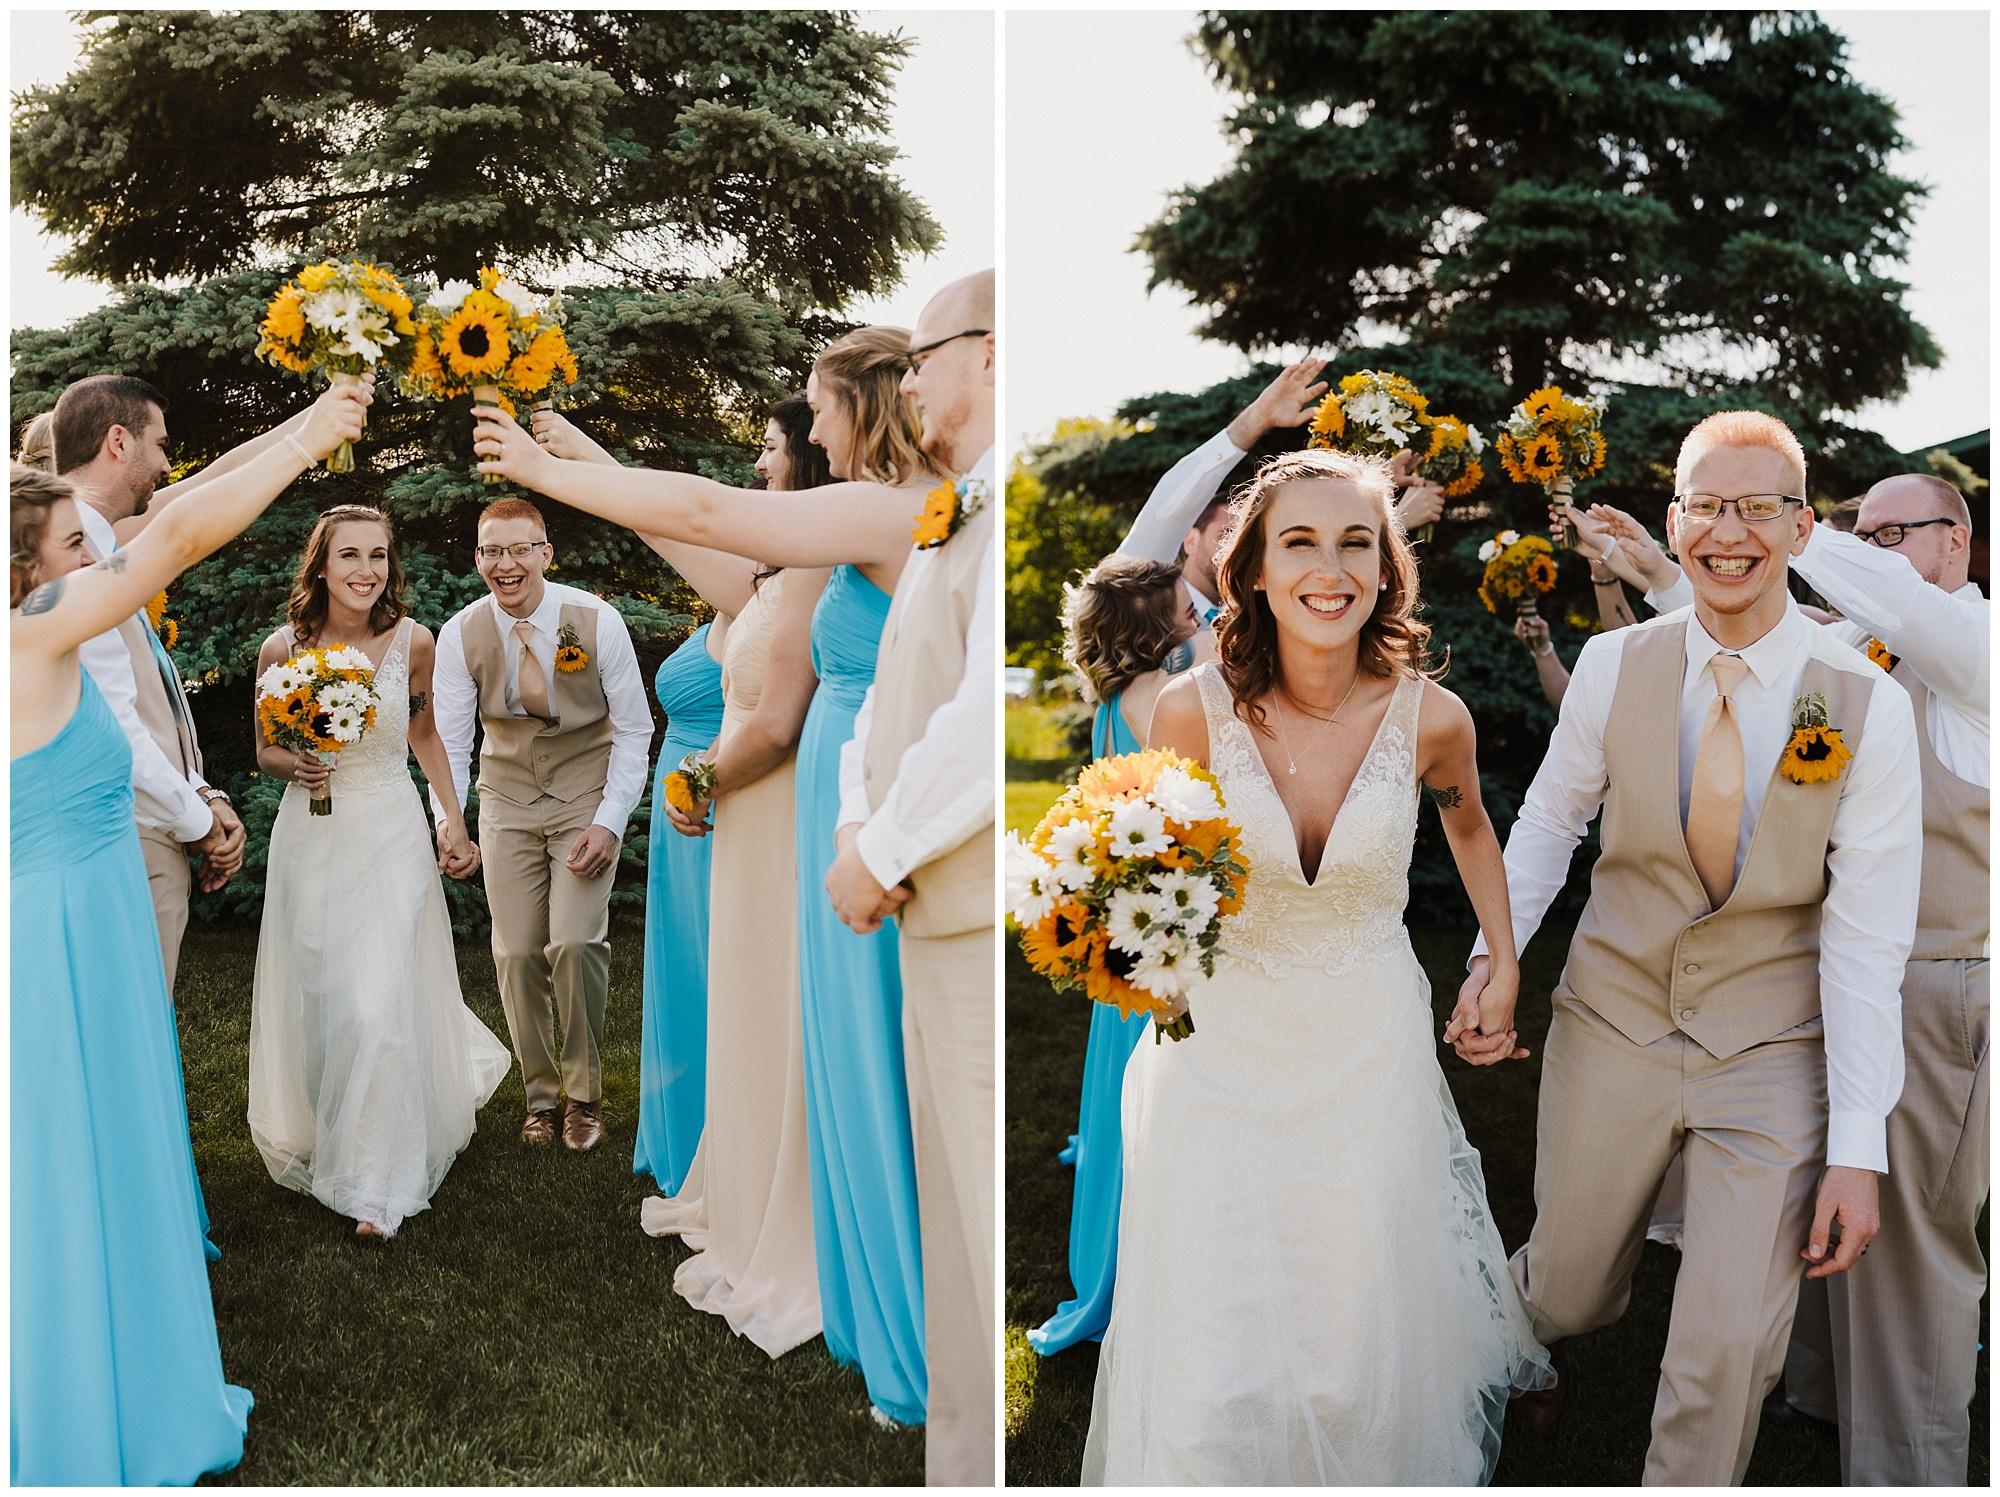 Fenton Winery and Brewery Wedding_0055.jpg